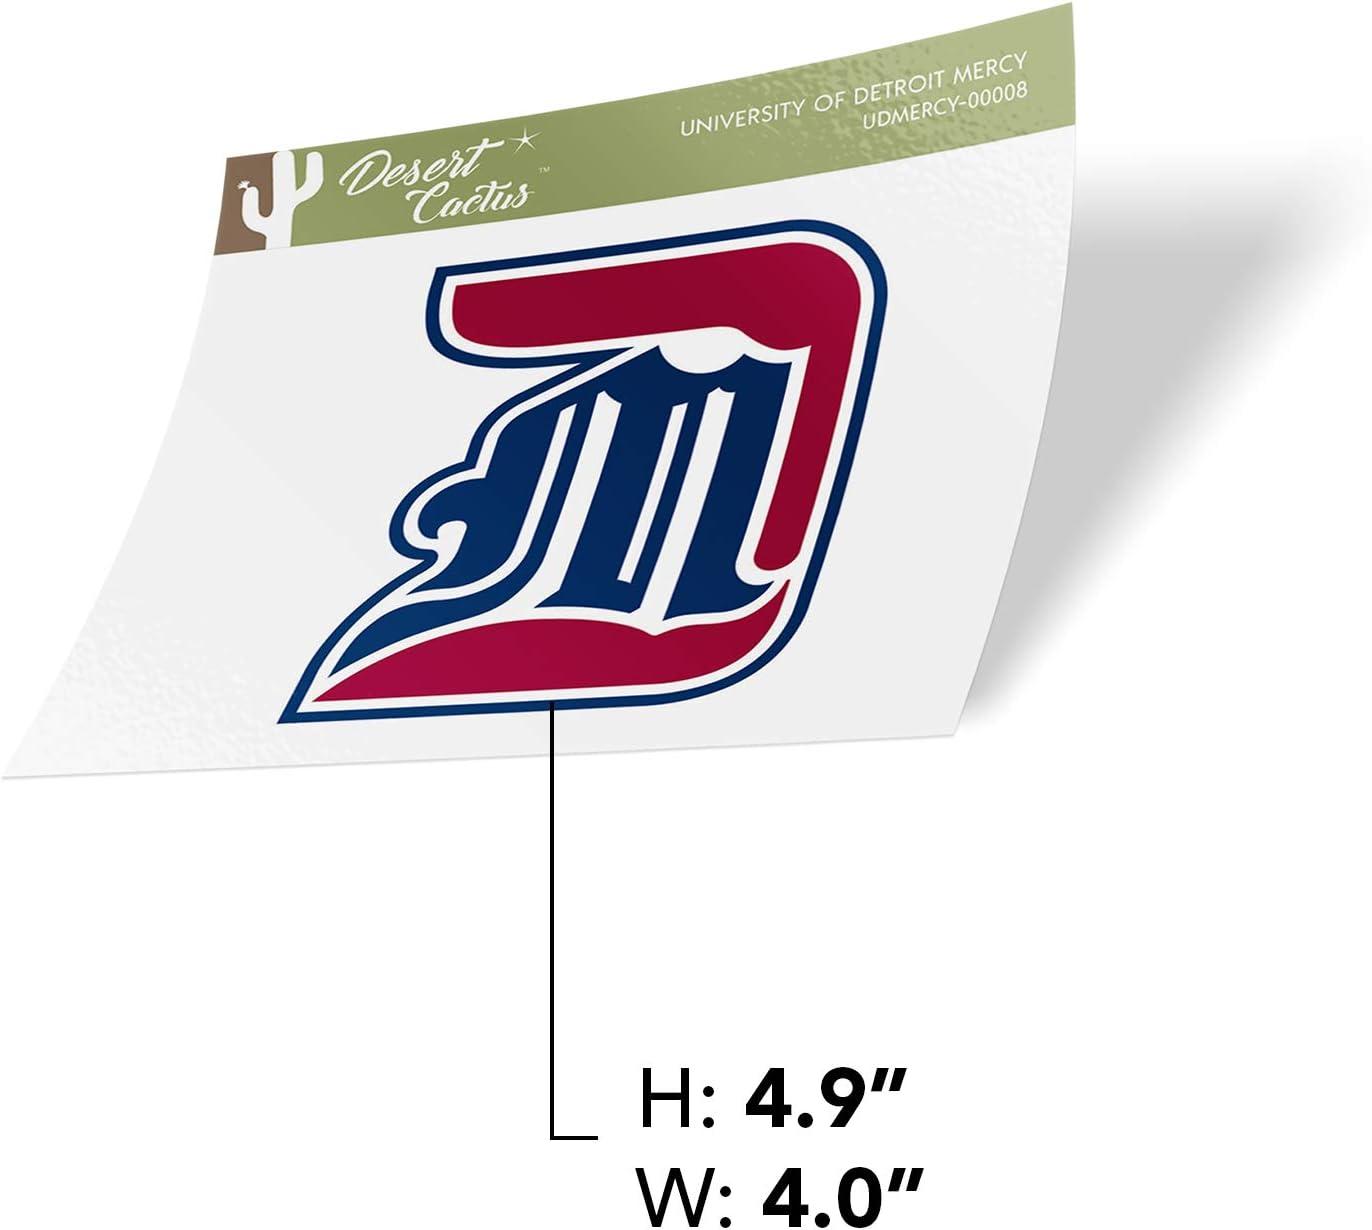 University of Detroit Mercy UDM Titans NCAA Vinyl Decal Laptop Water Bottle Car Scrapbook Sticker - 00008